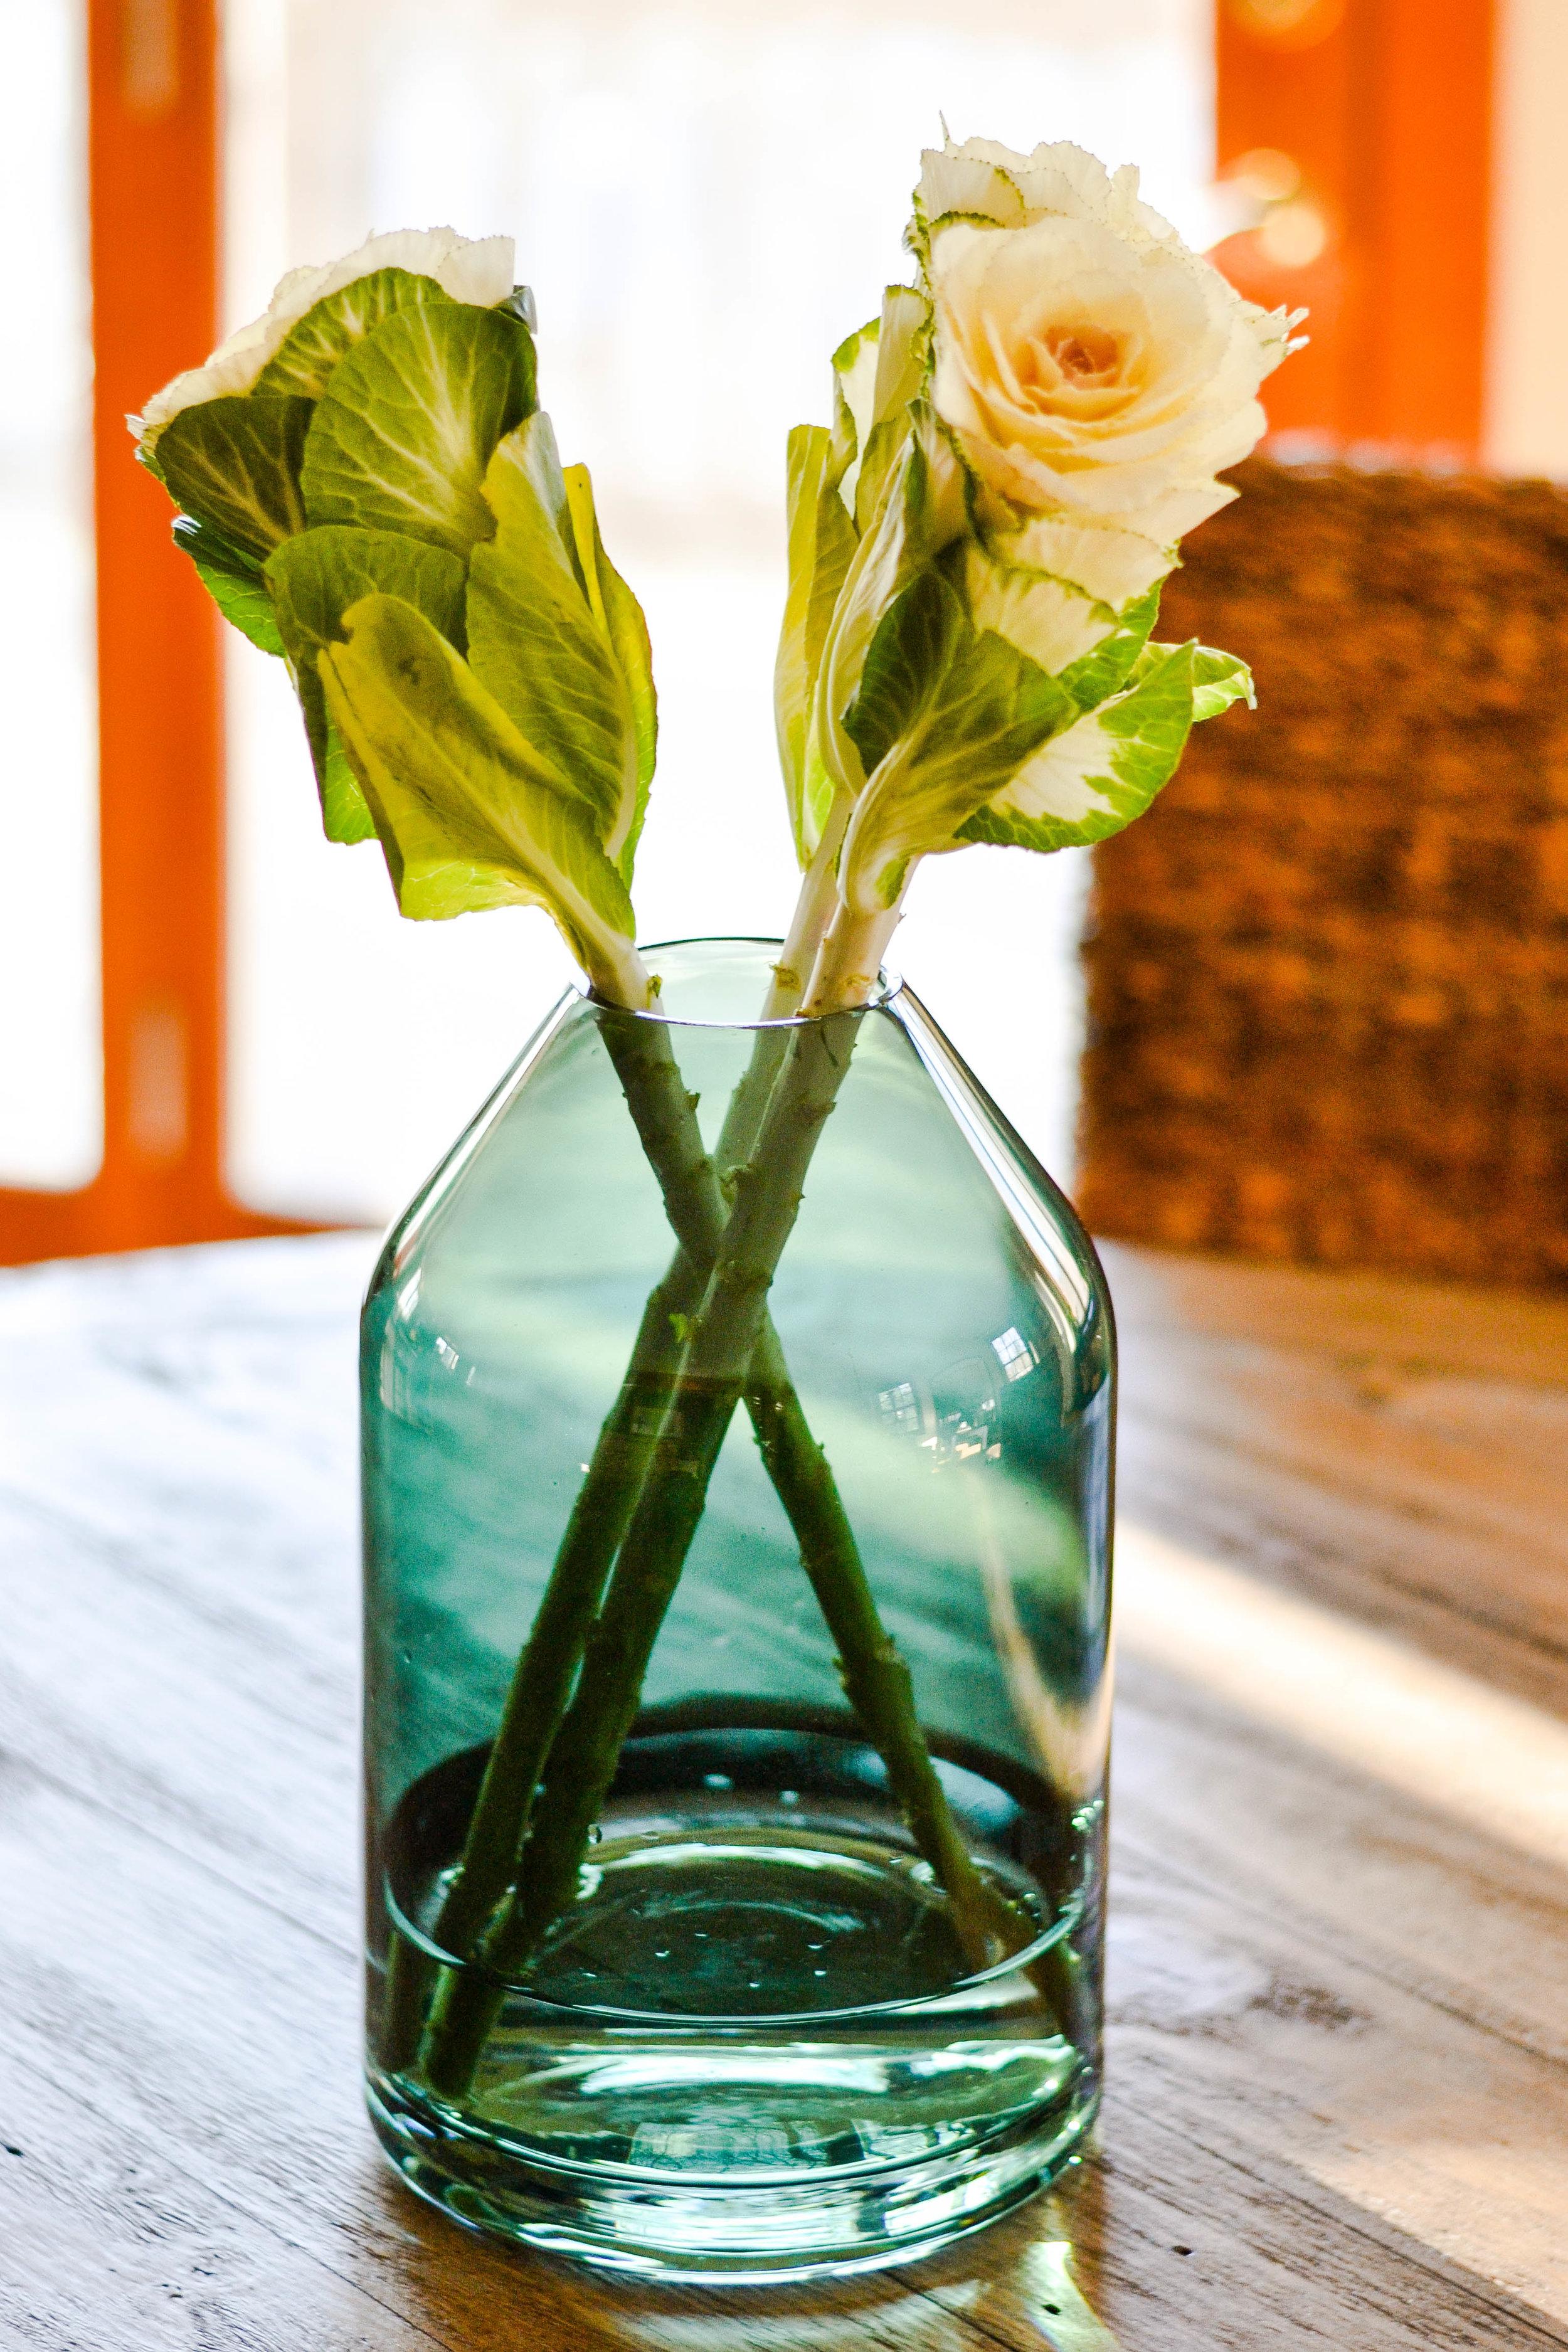 PilgrimProjectcabbageflower.jpg